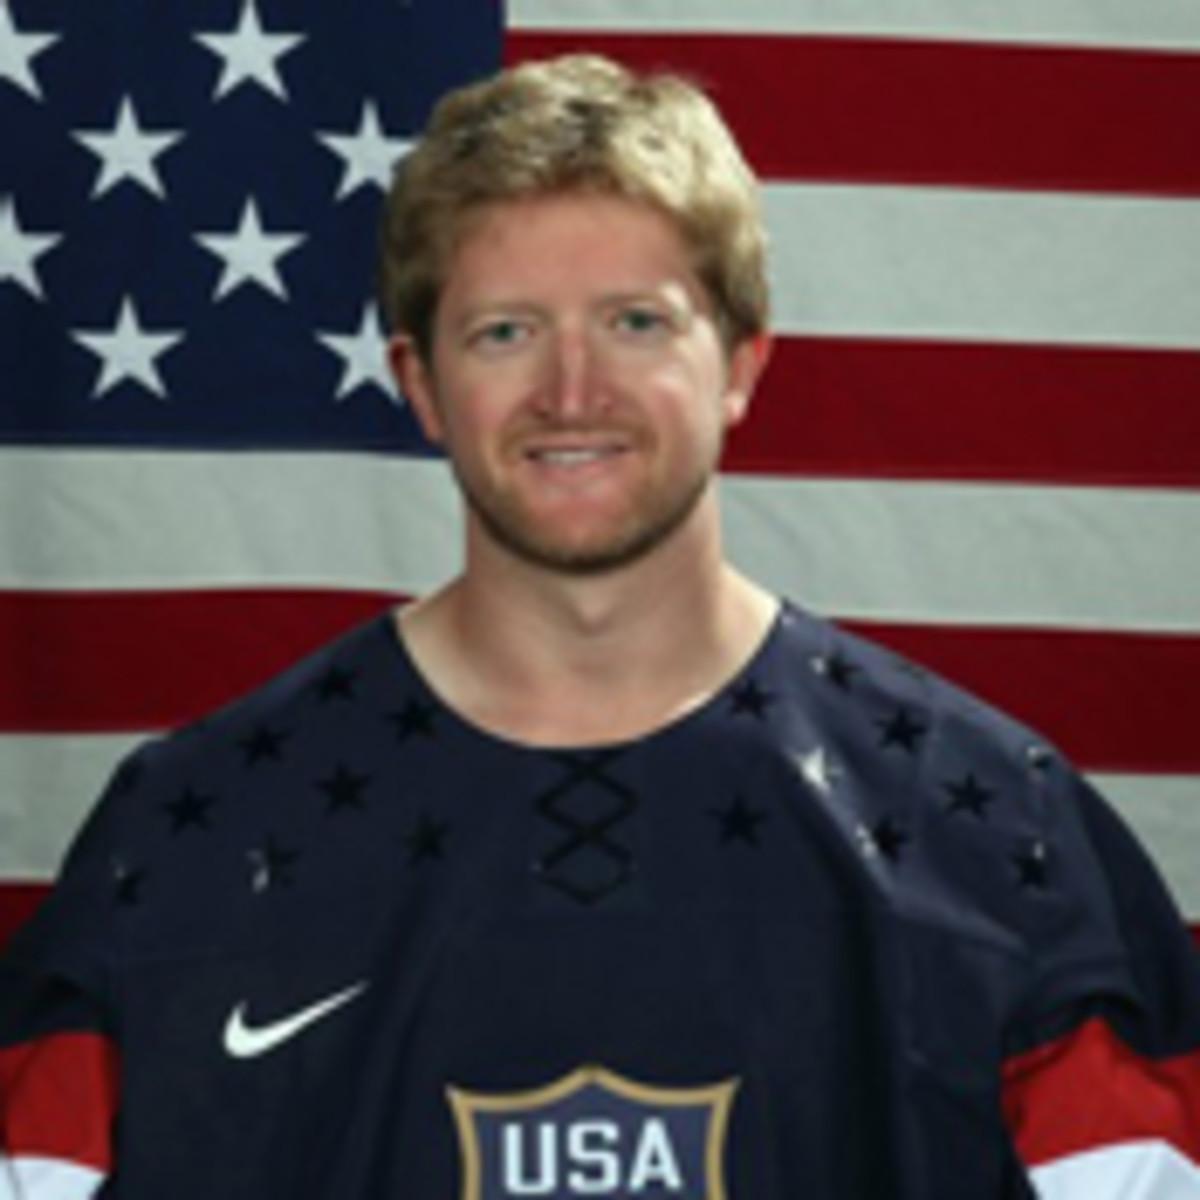 paul martin 2014 us men's olympic hockey